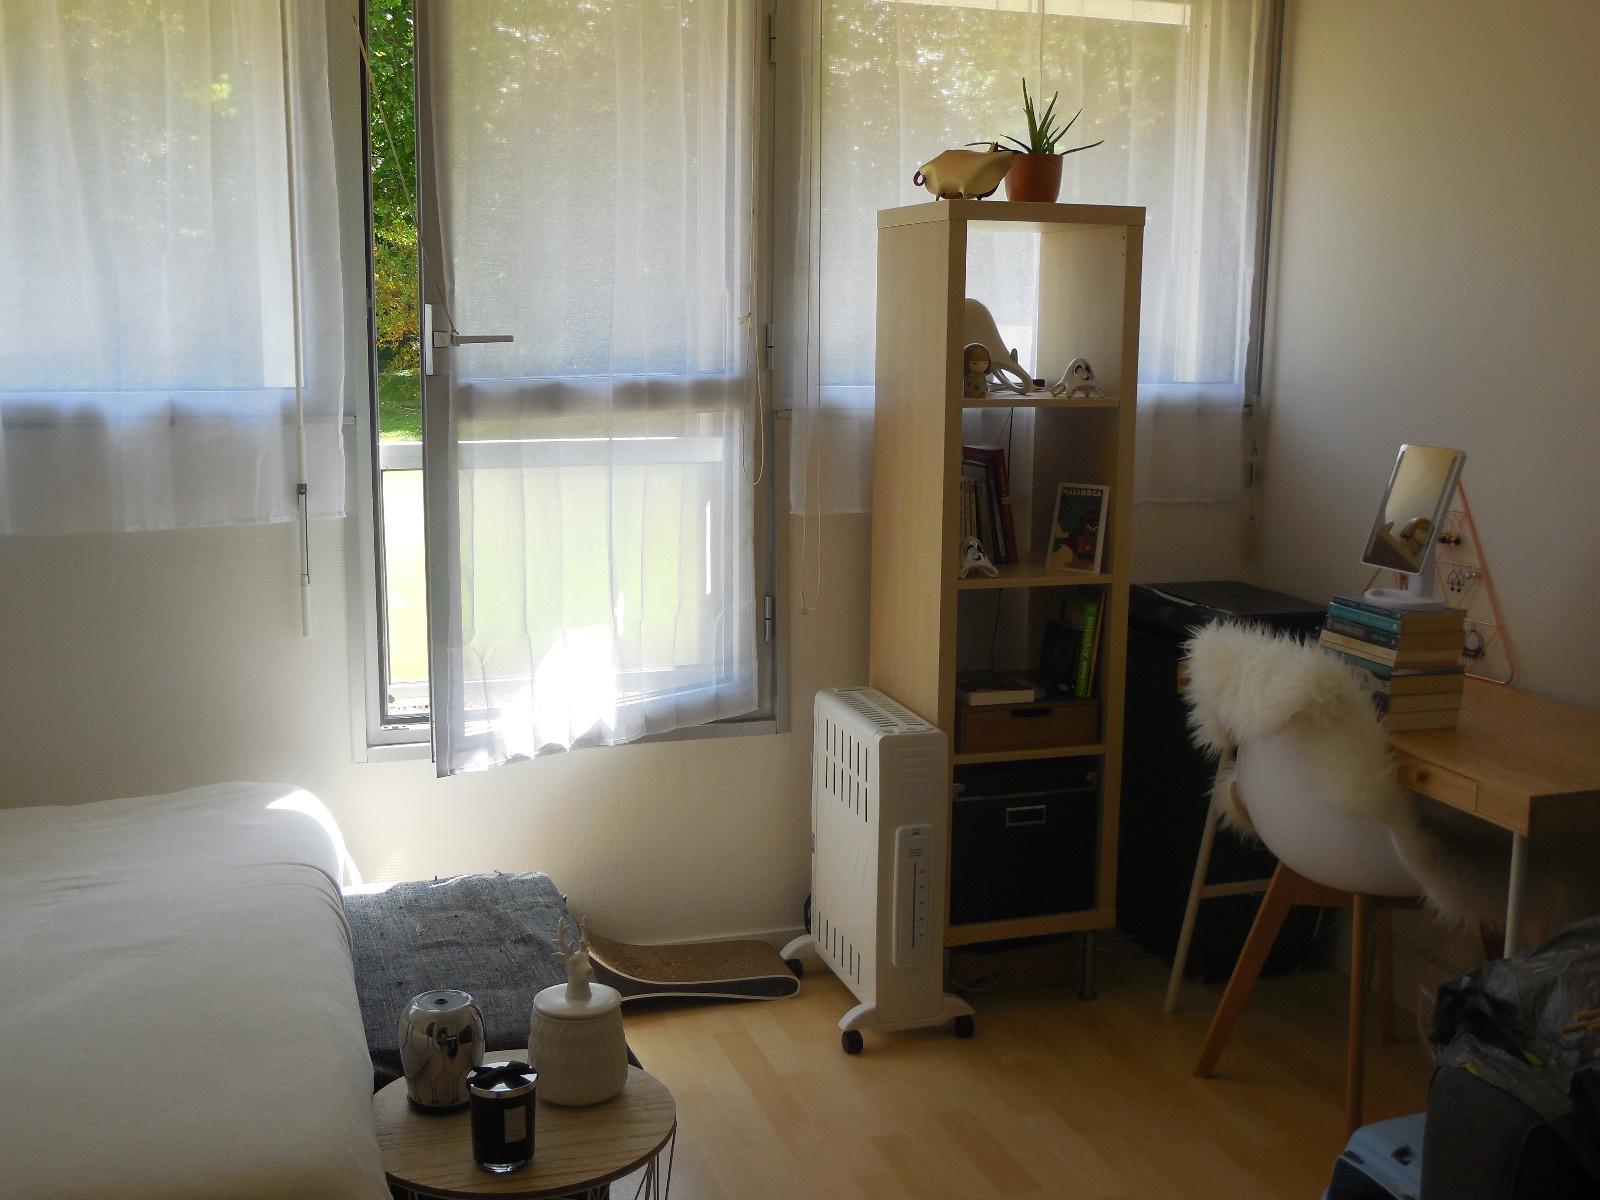 appartement la rochelle STUDIO LA ROCHELLE SECTEUR LA GENETTE